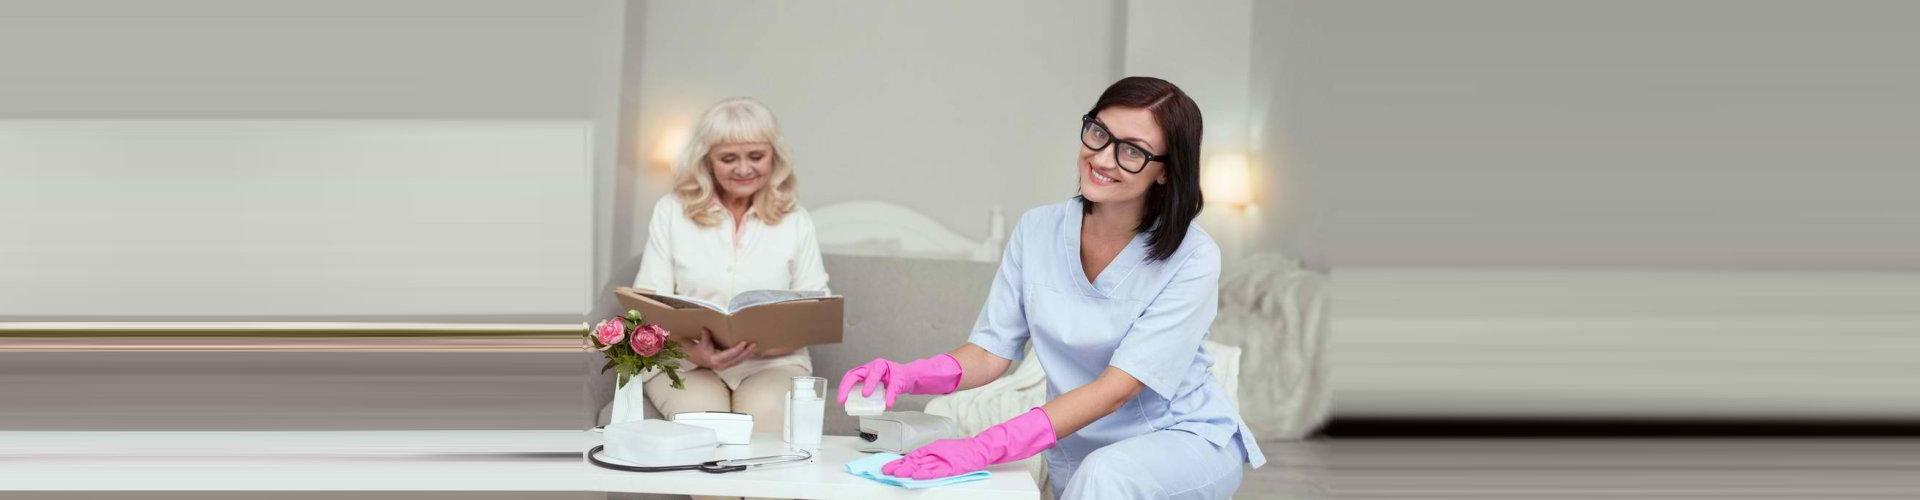 caregiver doing household chore